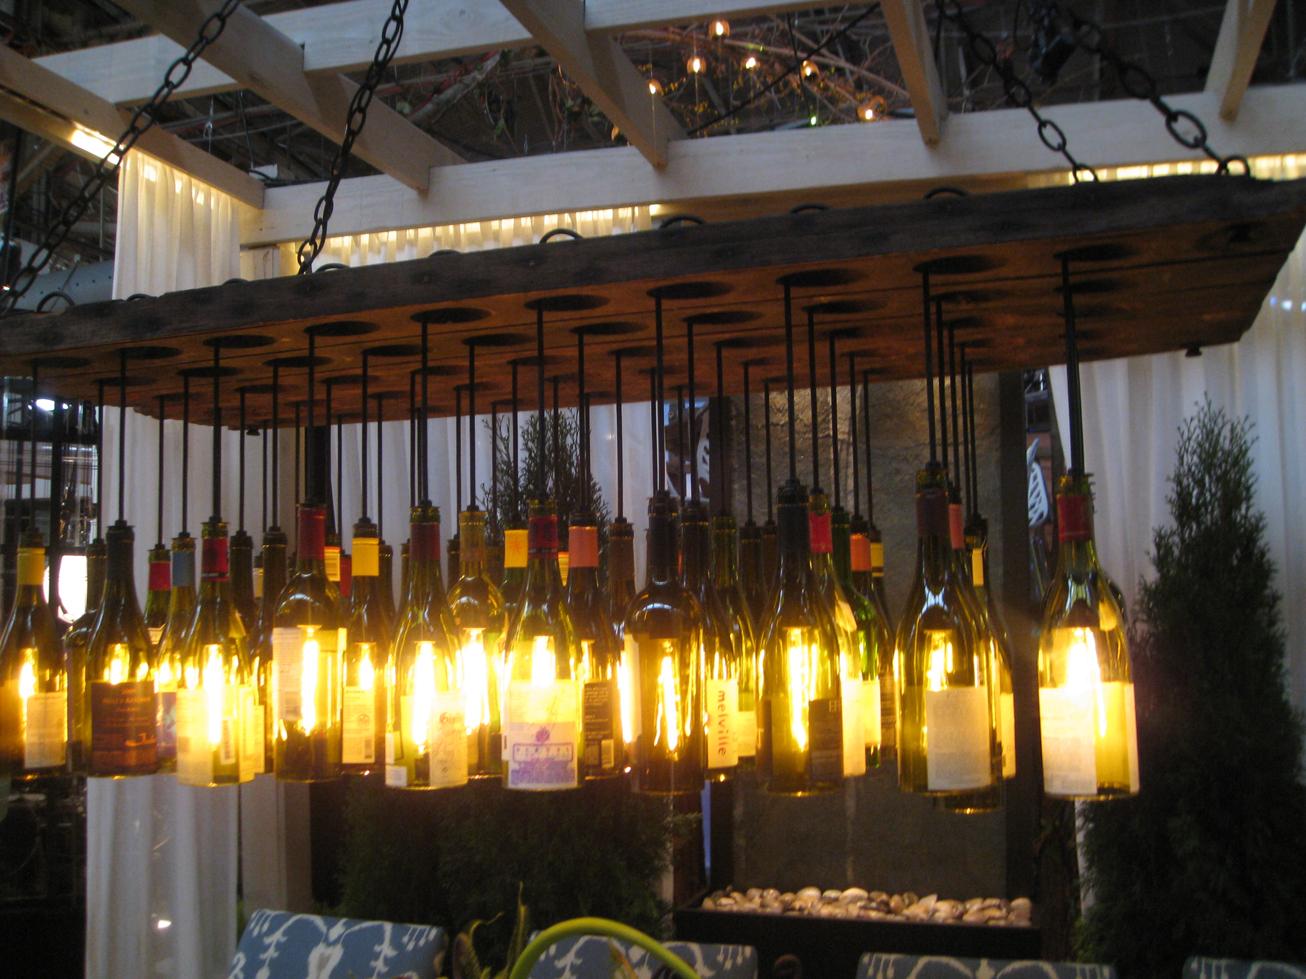 Distinctive chandeliers featured at architectural digest home design show arts observer - Wine bottle light fixture chandelier ...